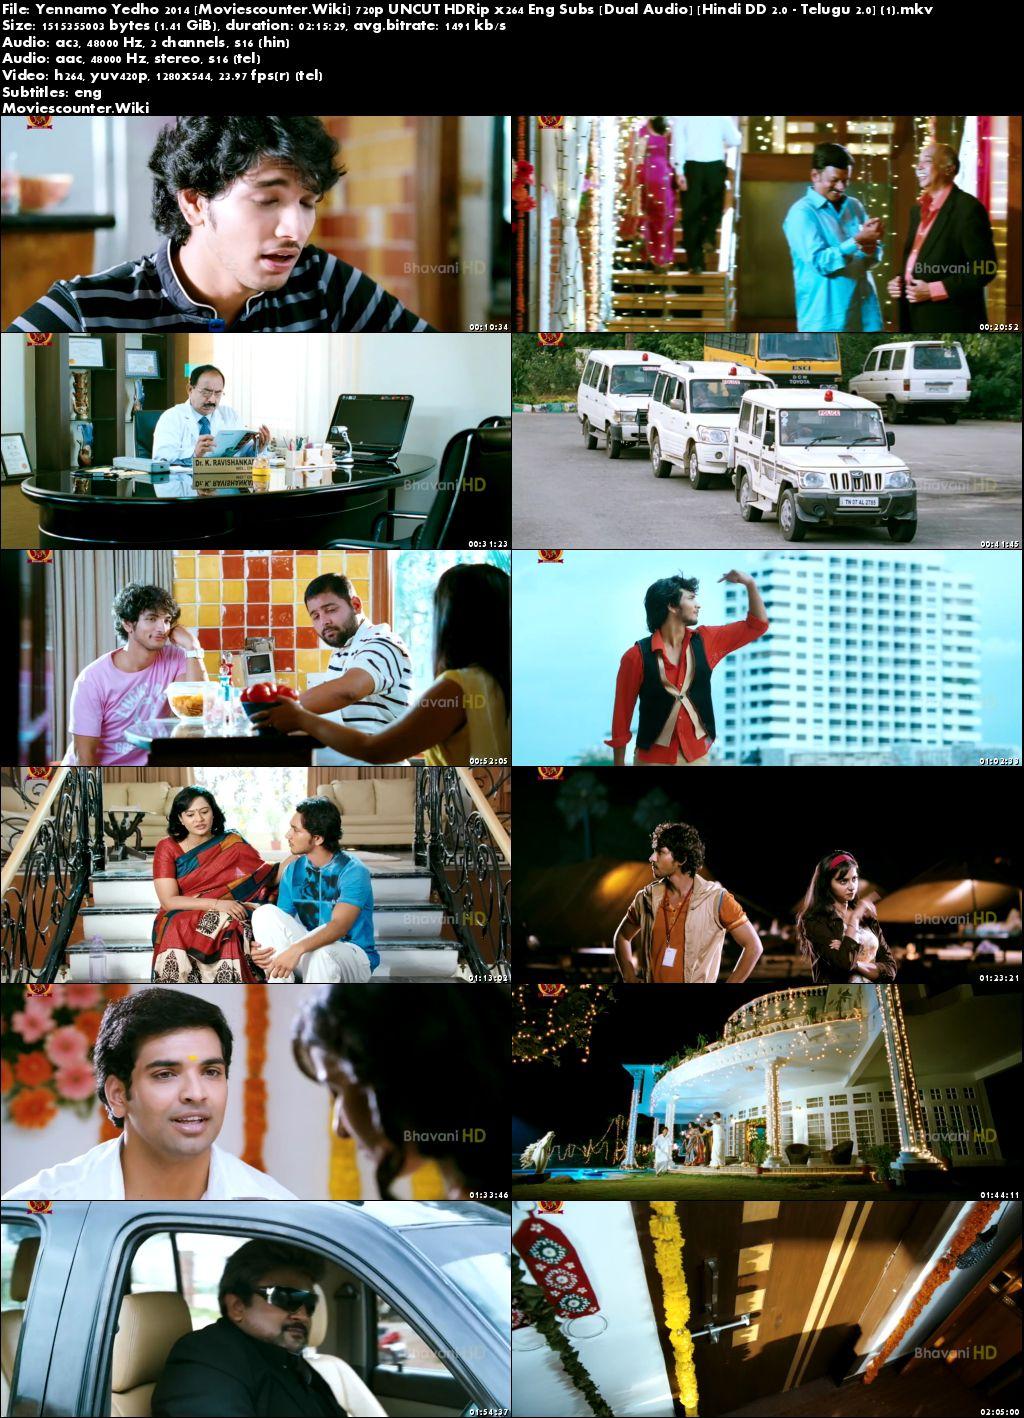 Screen Shots Yennamo Yedho 2014 Hindi Dubbed HD 720p